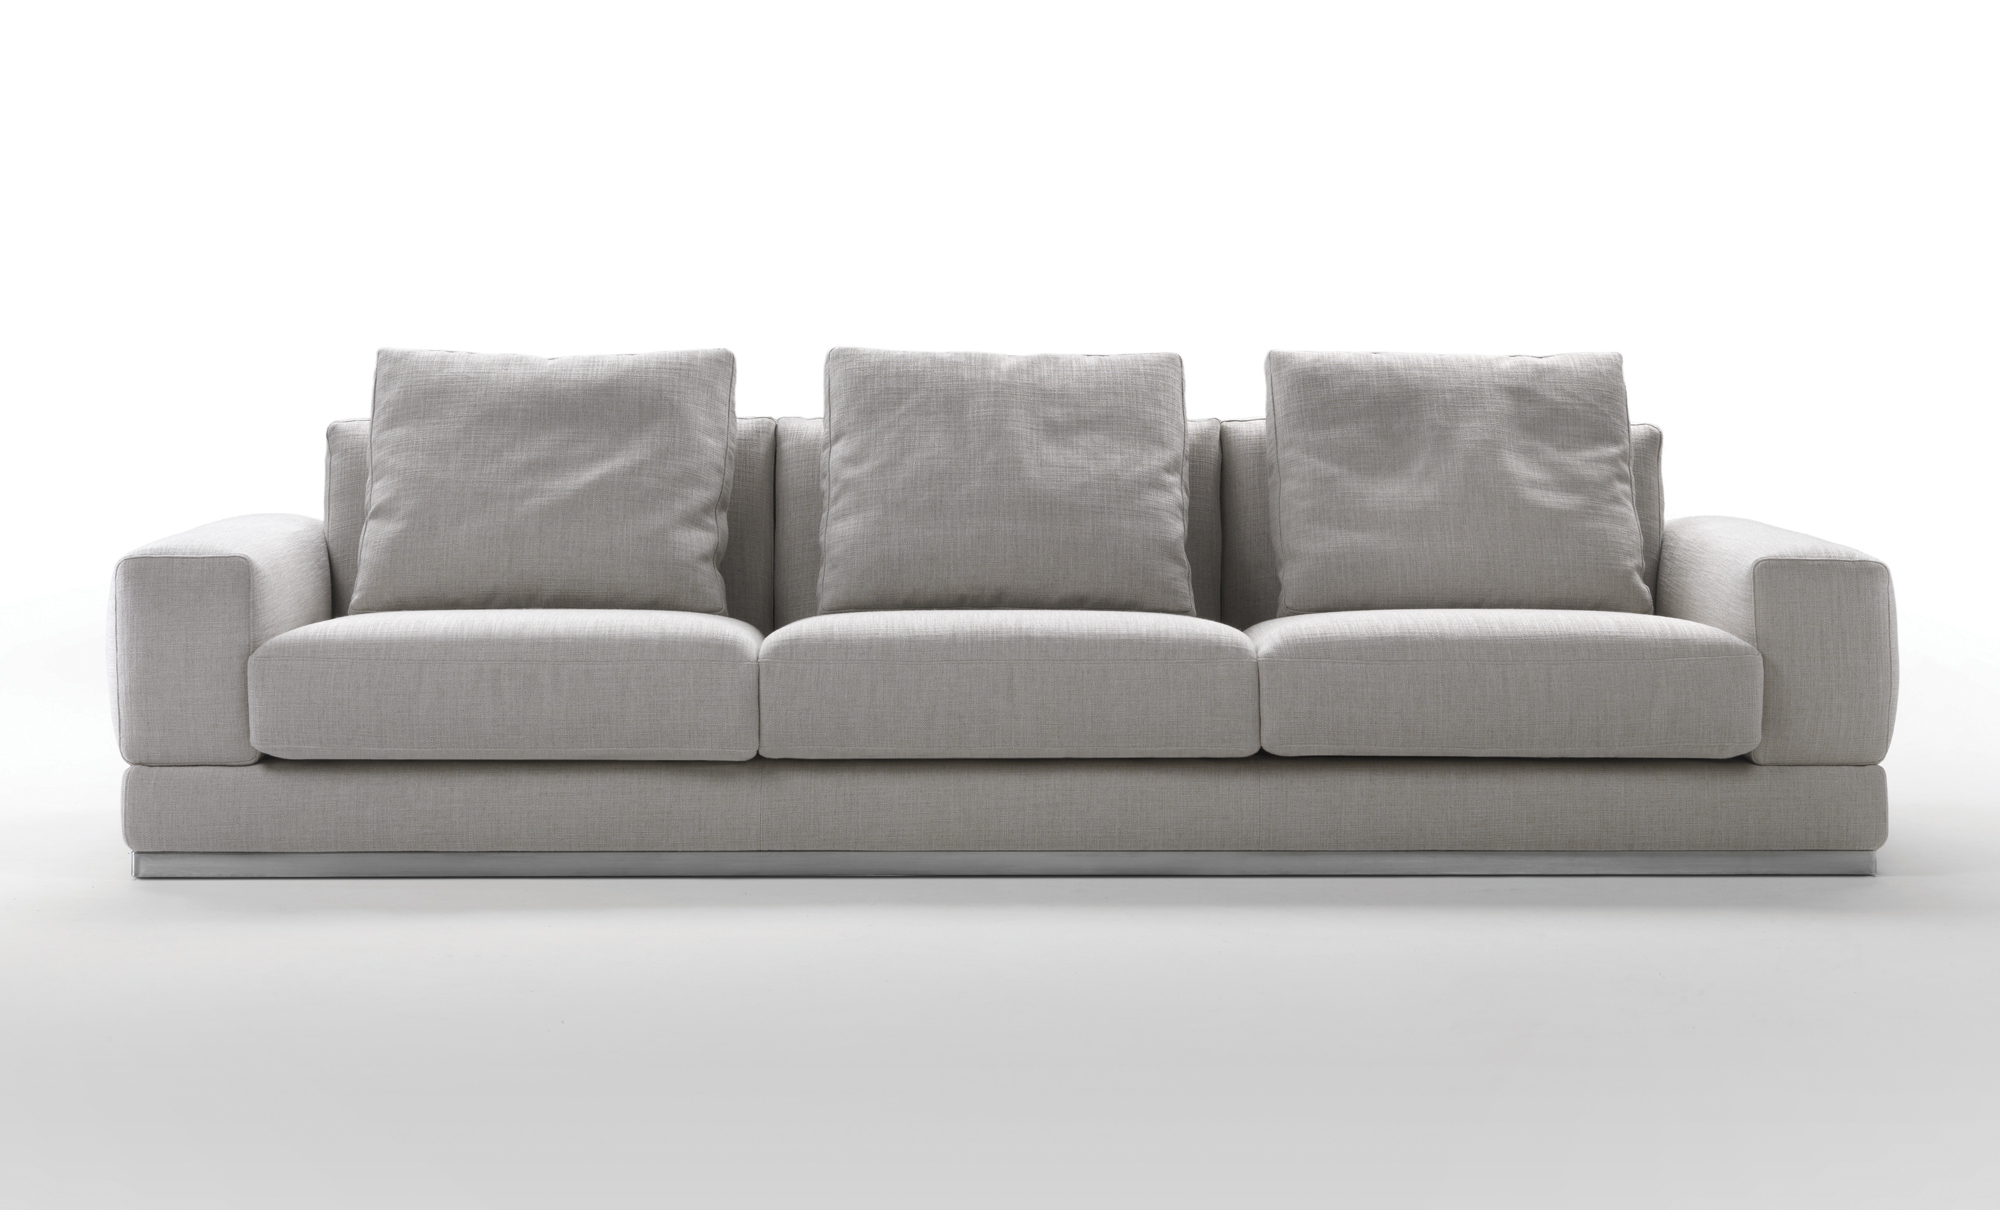 Recliner Sofas Fanuli Furniture